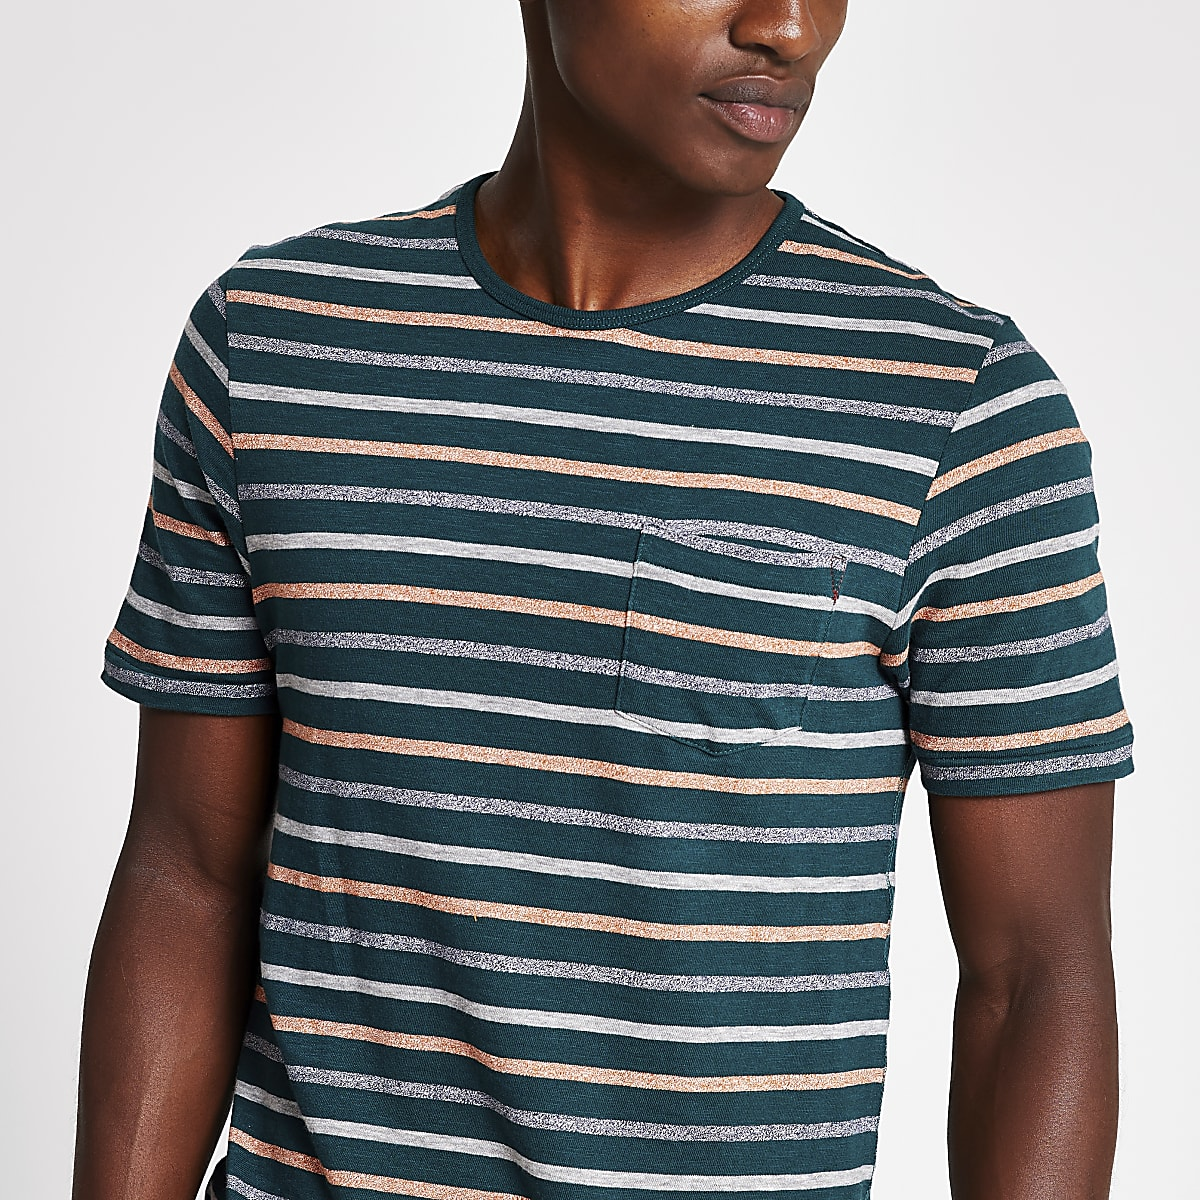 Jack and Jones green stripe print T-shirt